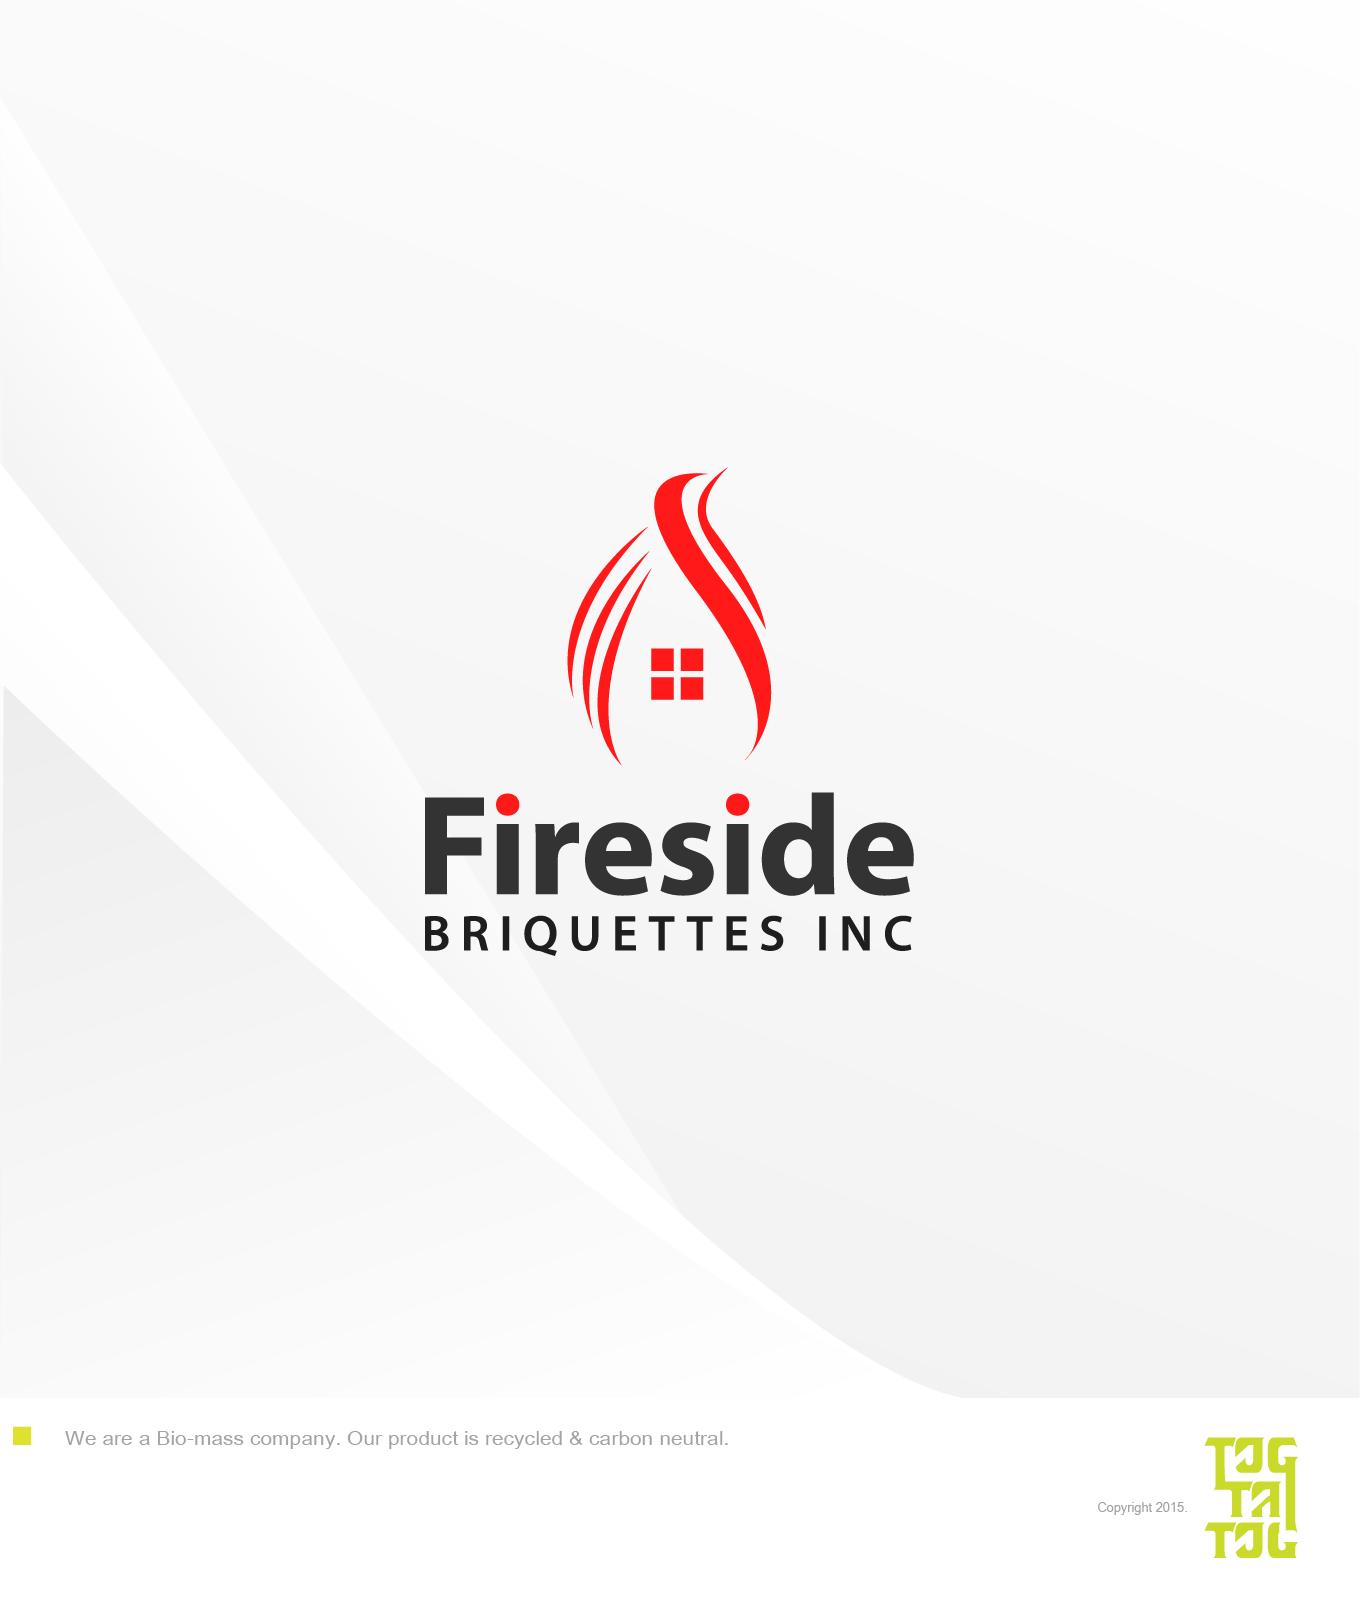 Logo Design by Roel Laurito - Entry No. 18 in the Logo Design Contest Fun Logo Design for Fireside Briquettes Inc..